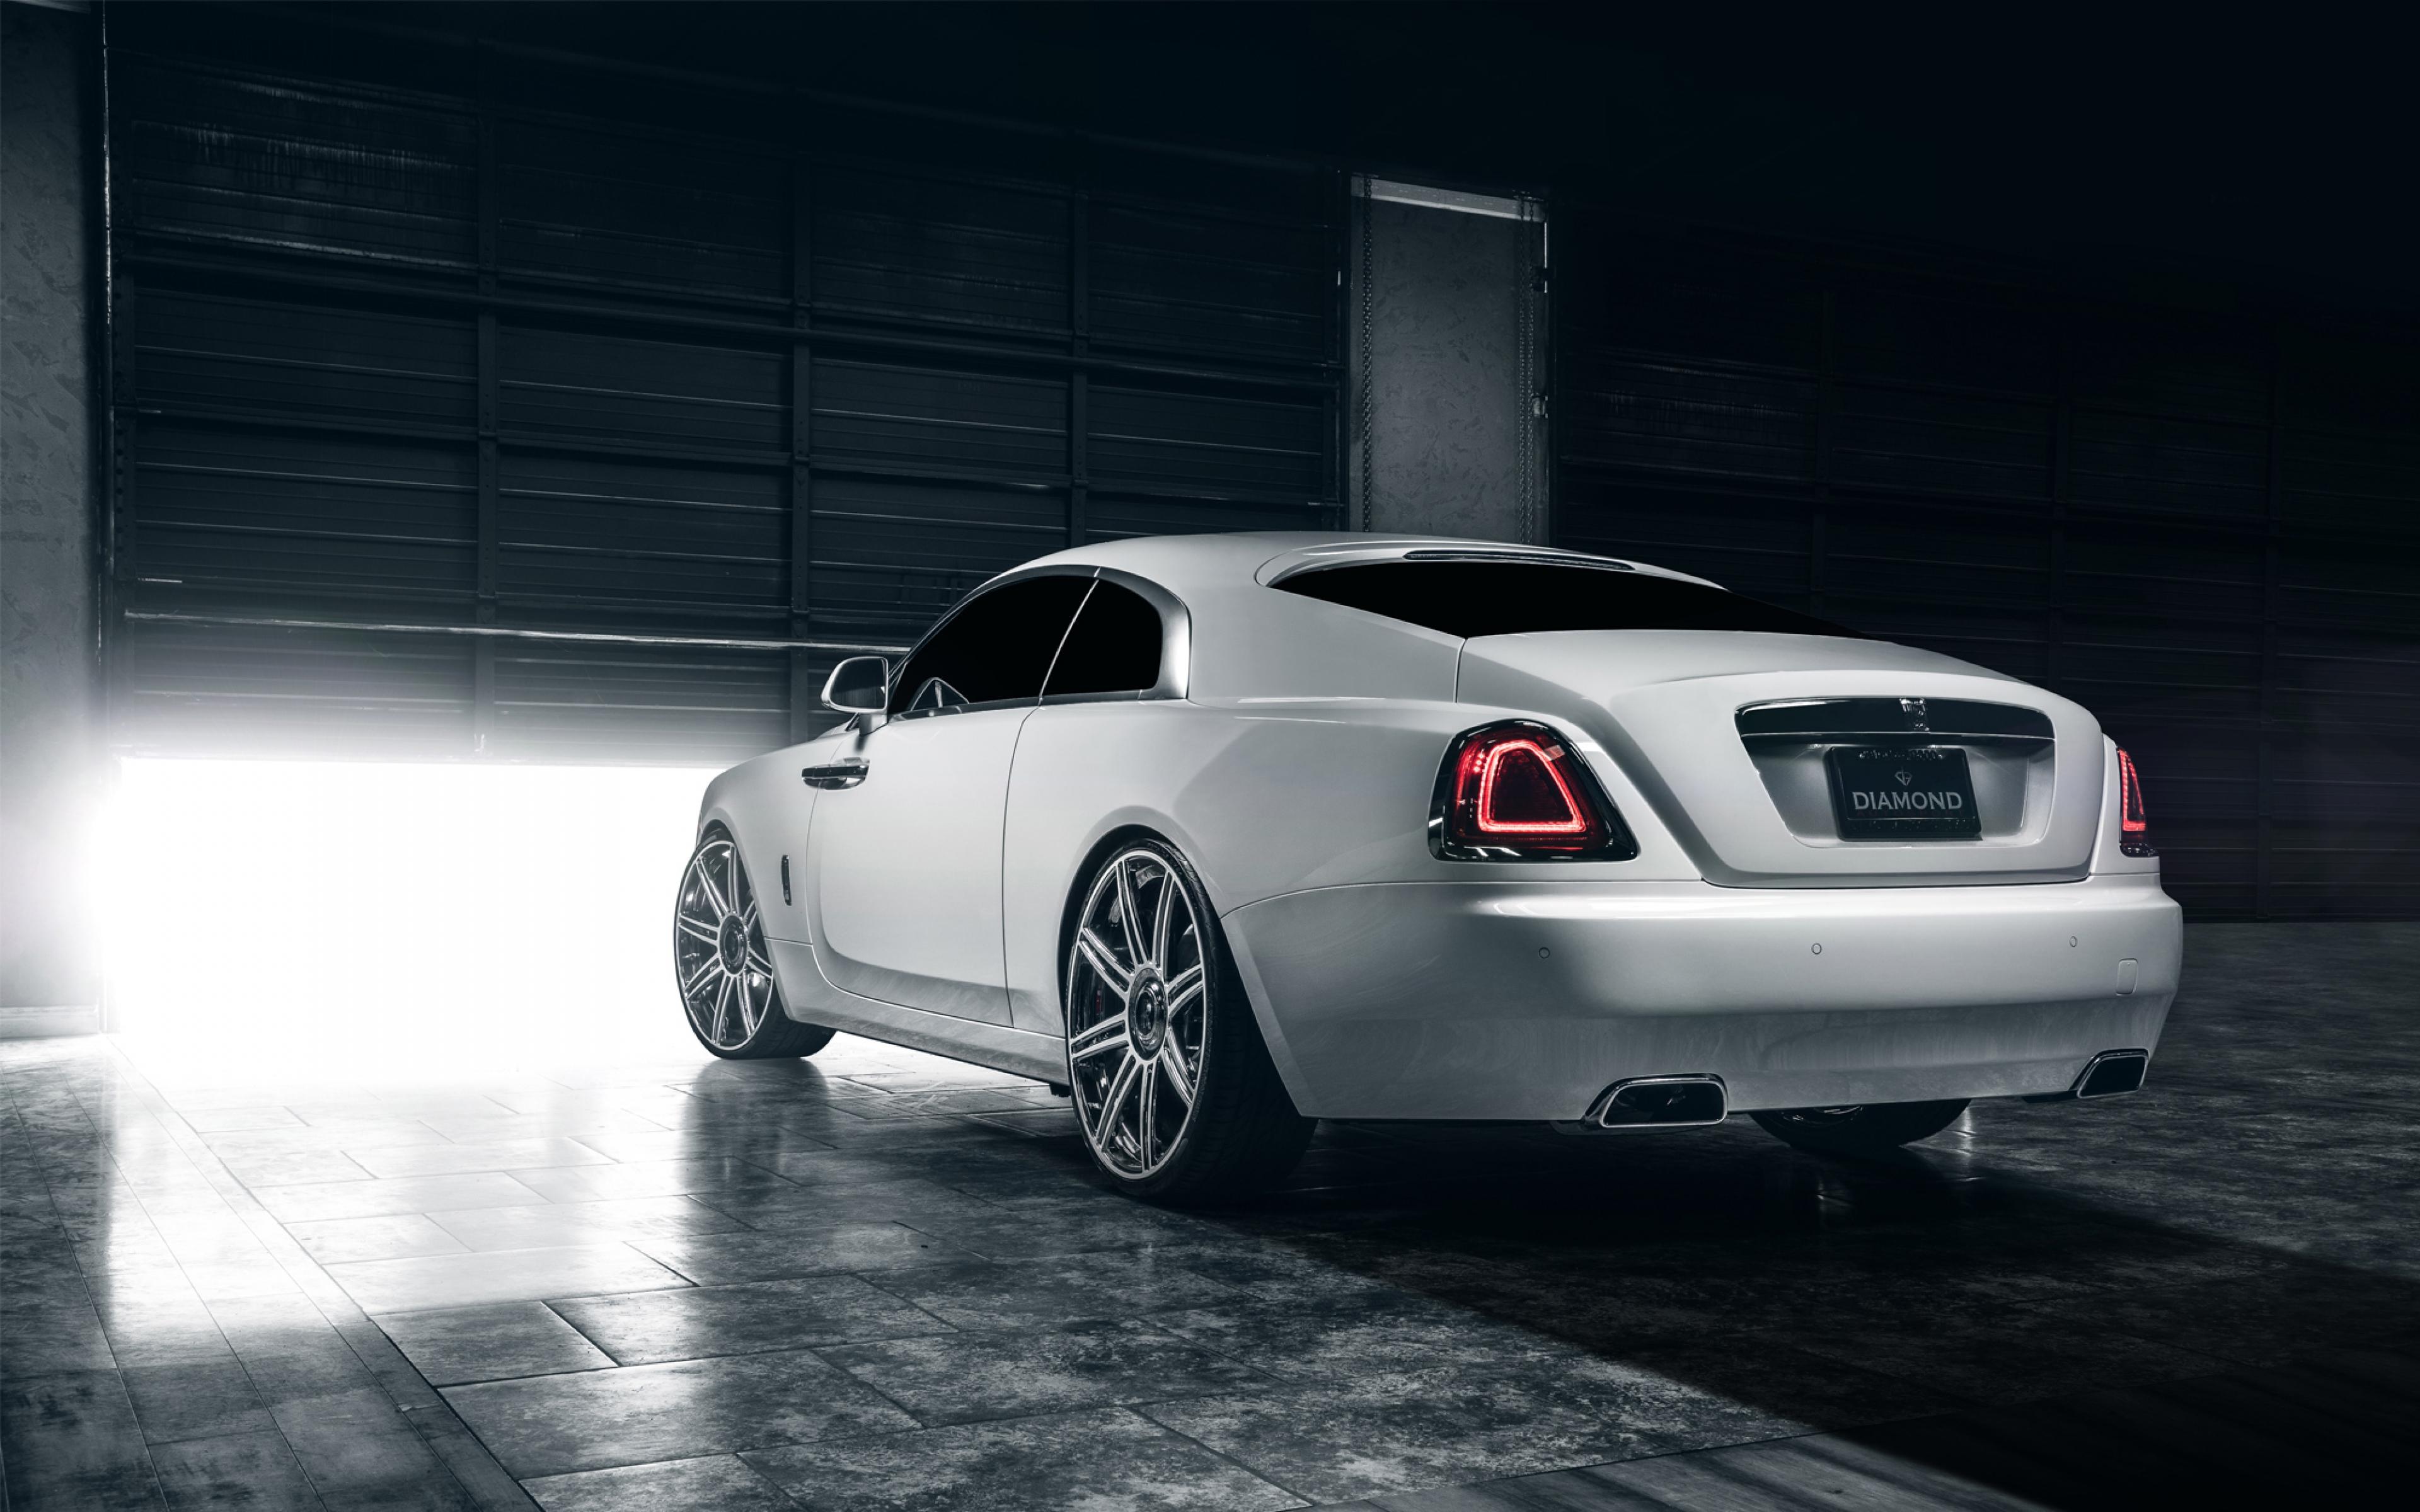 26 Stunning HD Luxury Wallpapers